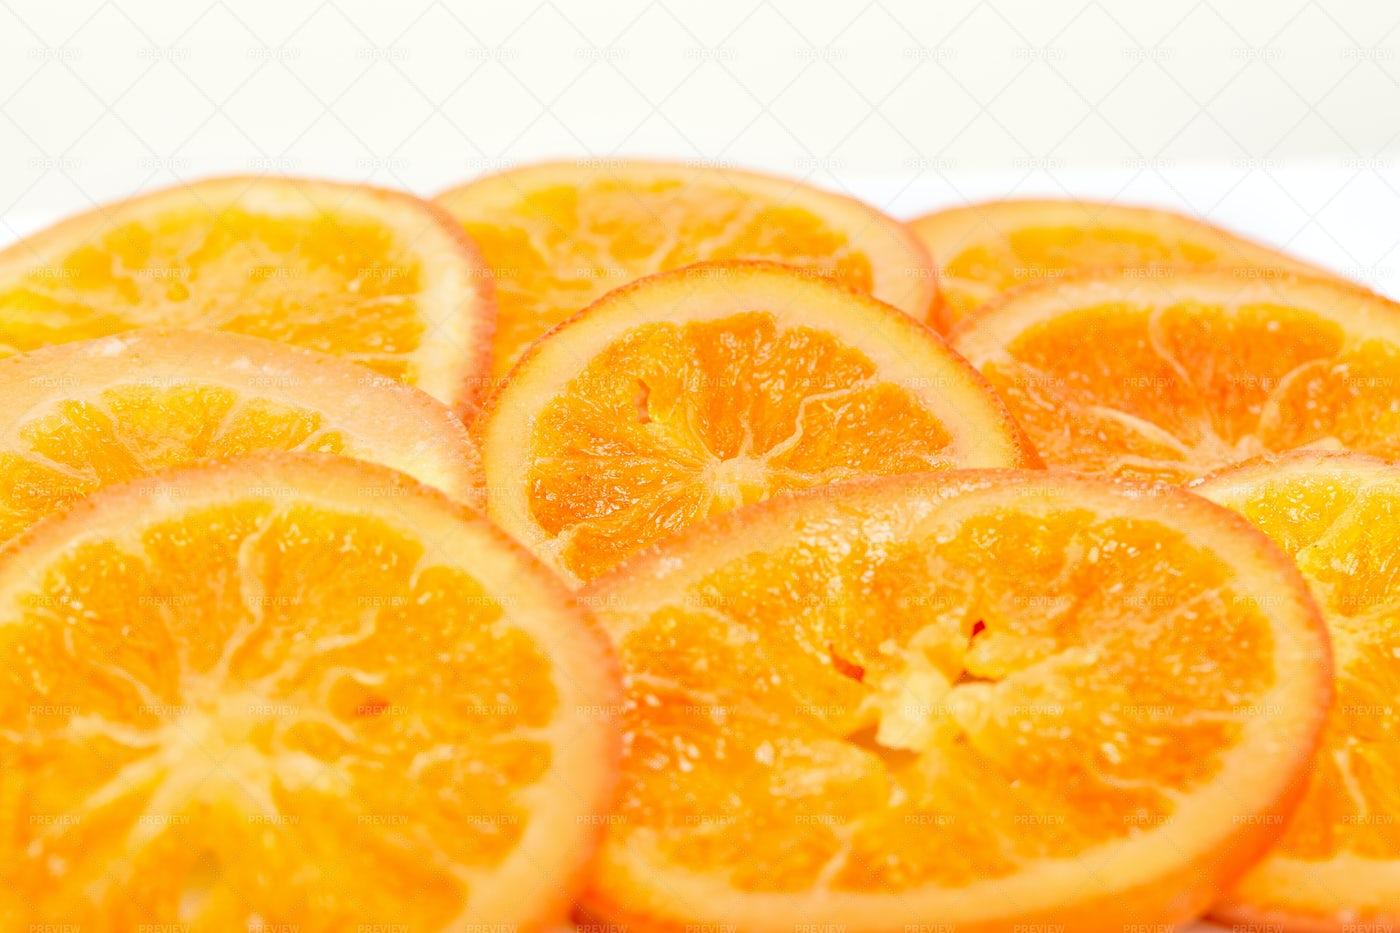 Pile Of Dried Orange Slices: Stock Photos